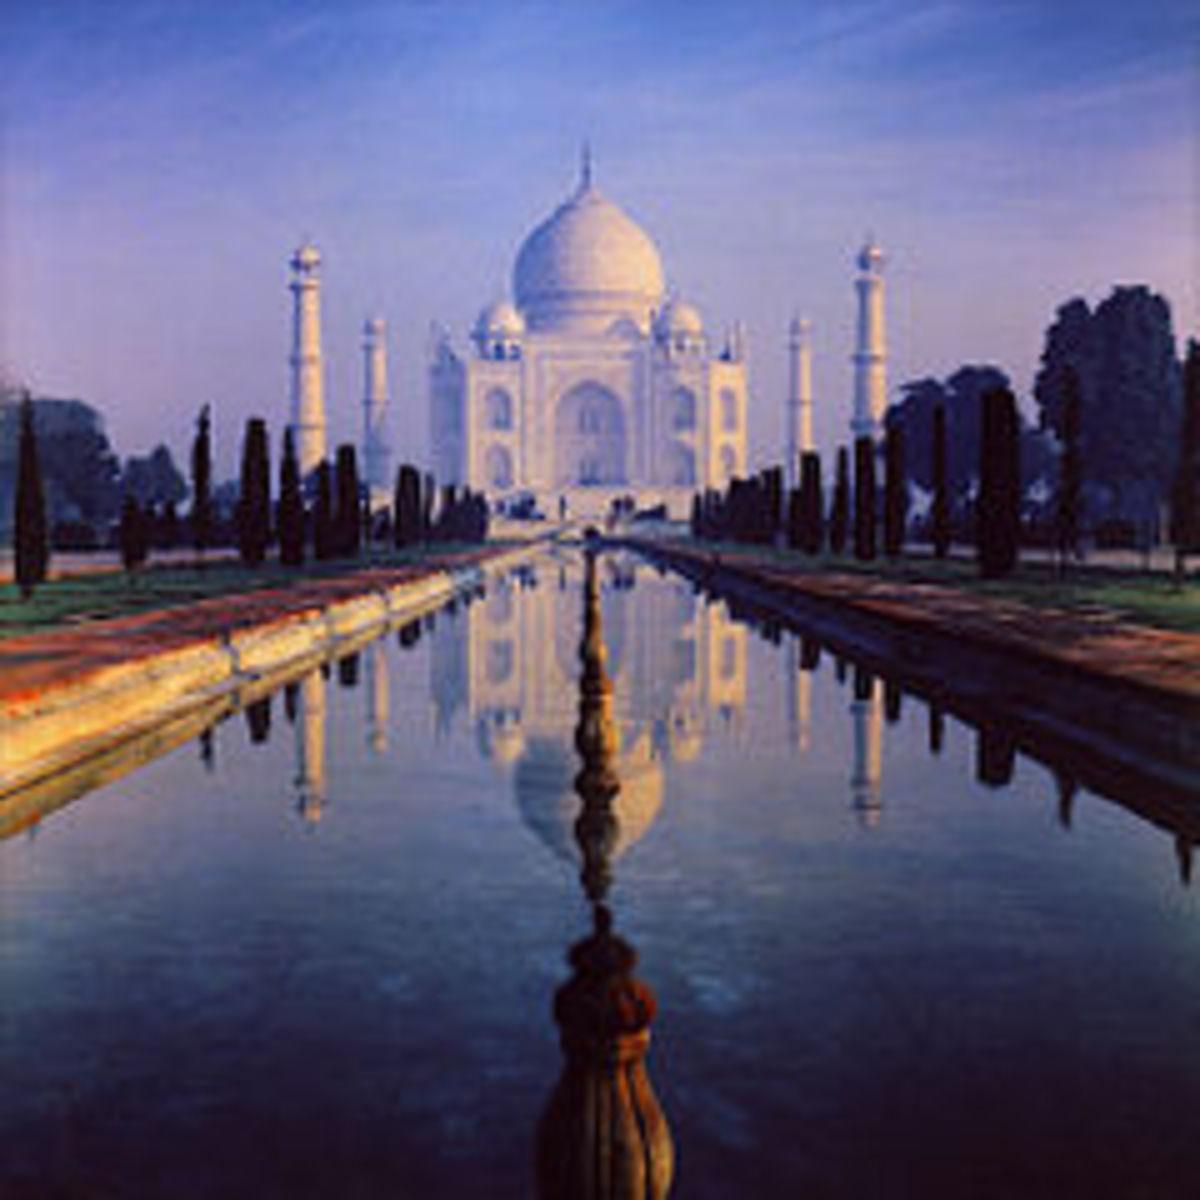 Night View of Taj Mahal